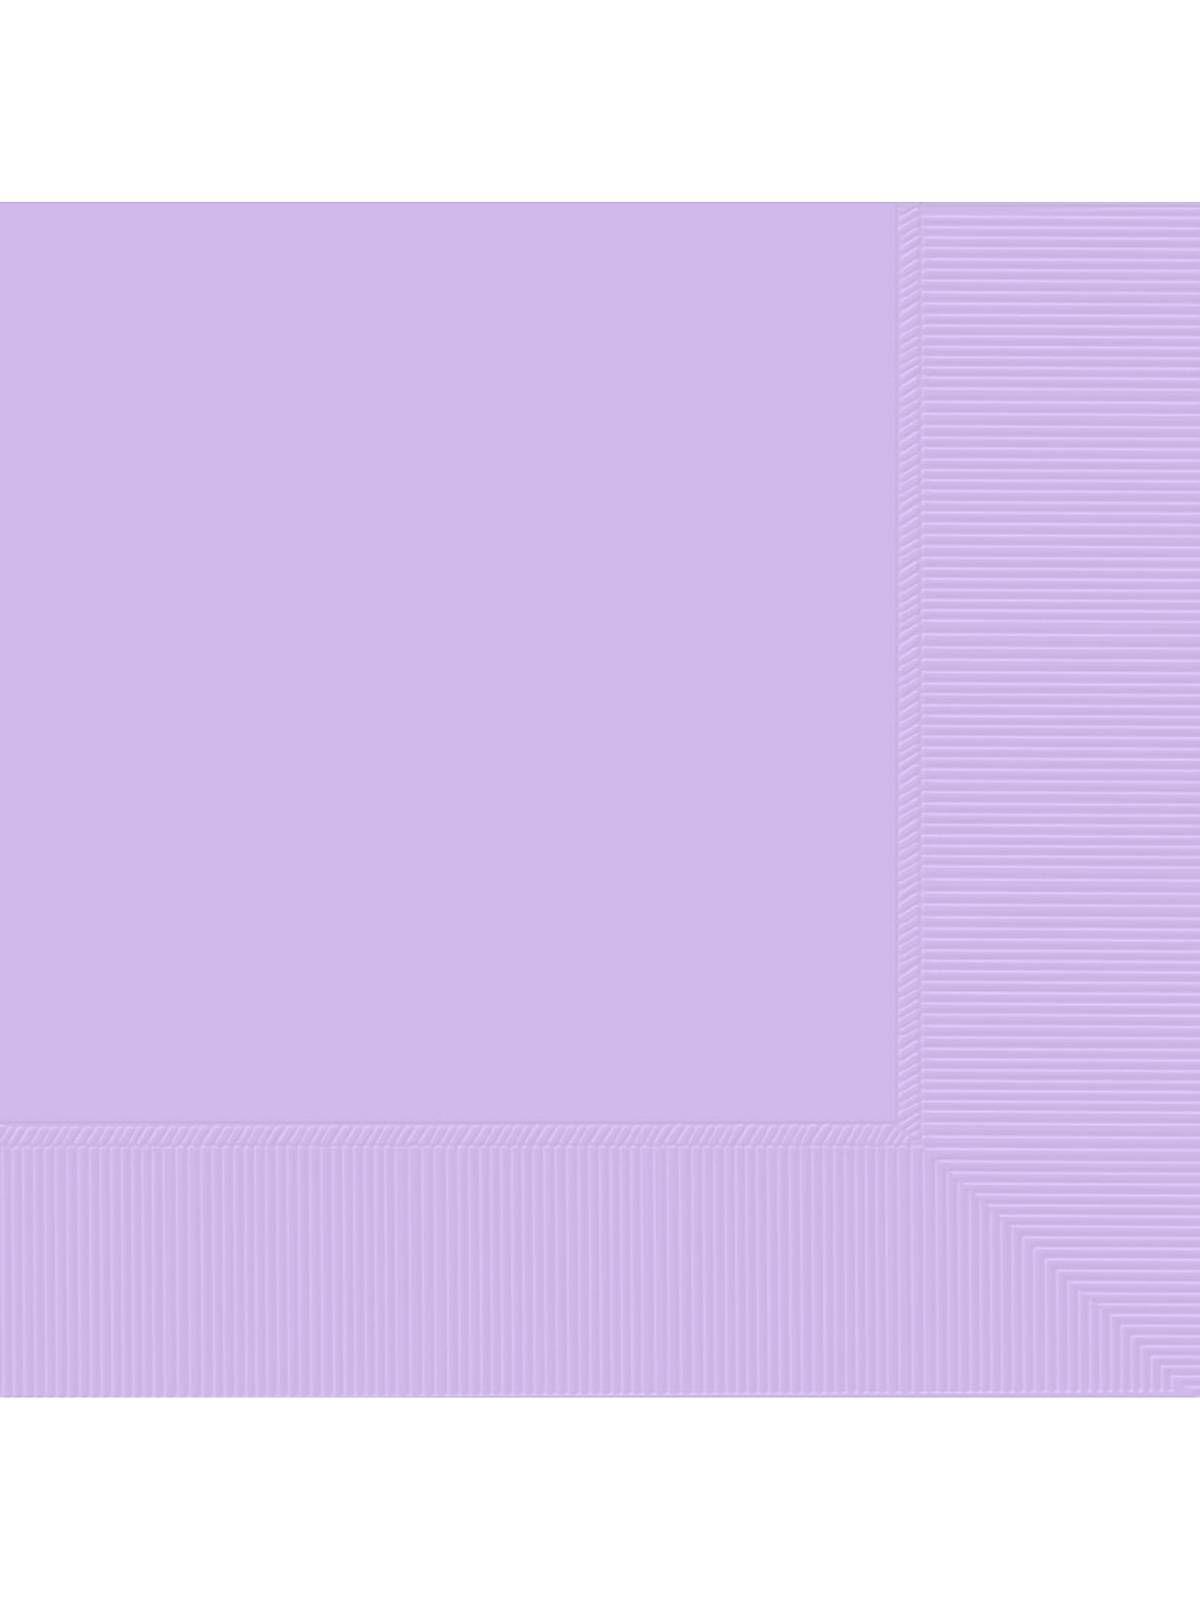 Lavender 2-Ply Beverage Napkins, 50ct. | Wholesale Solid Tableware Accessories